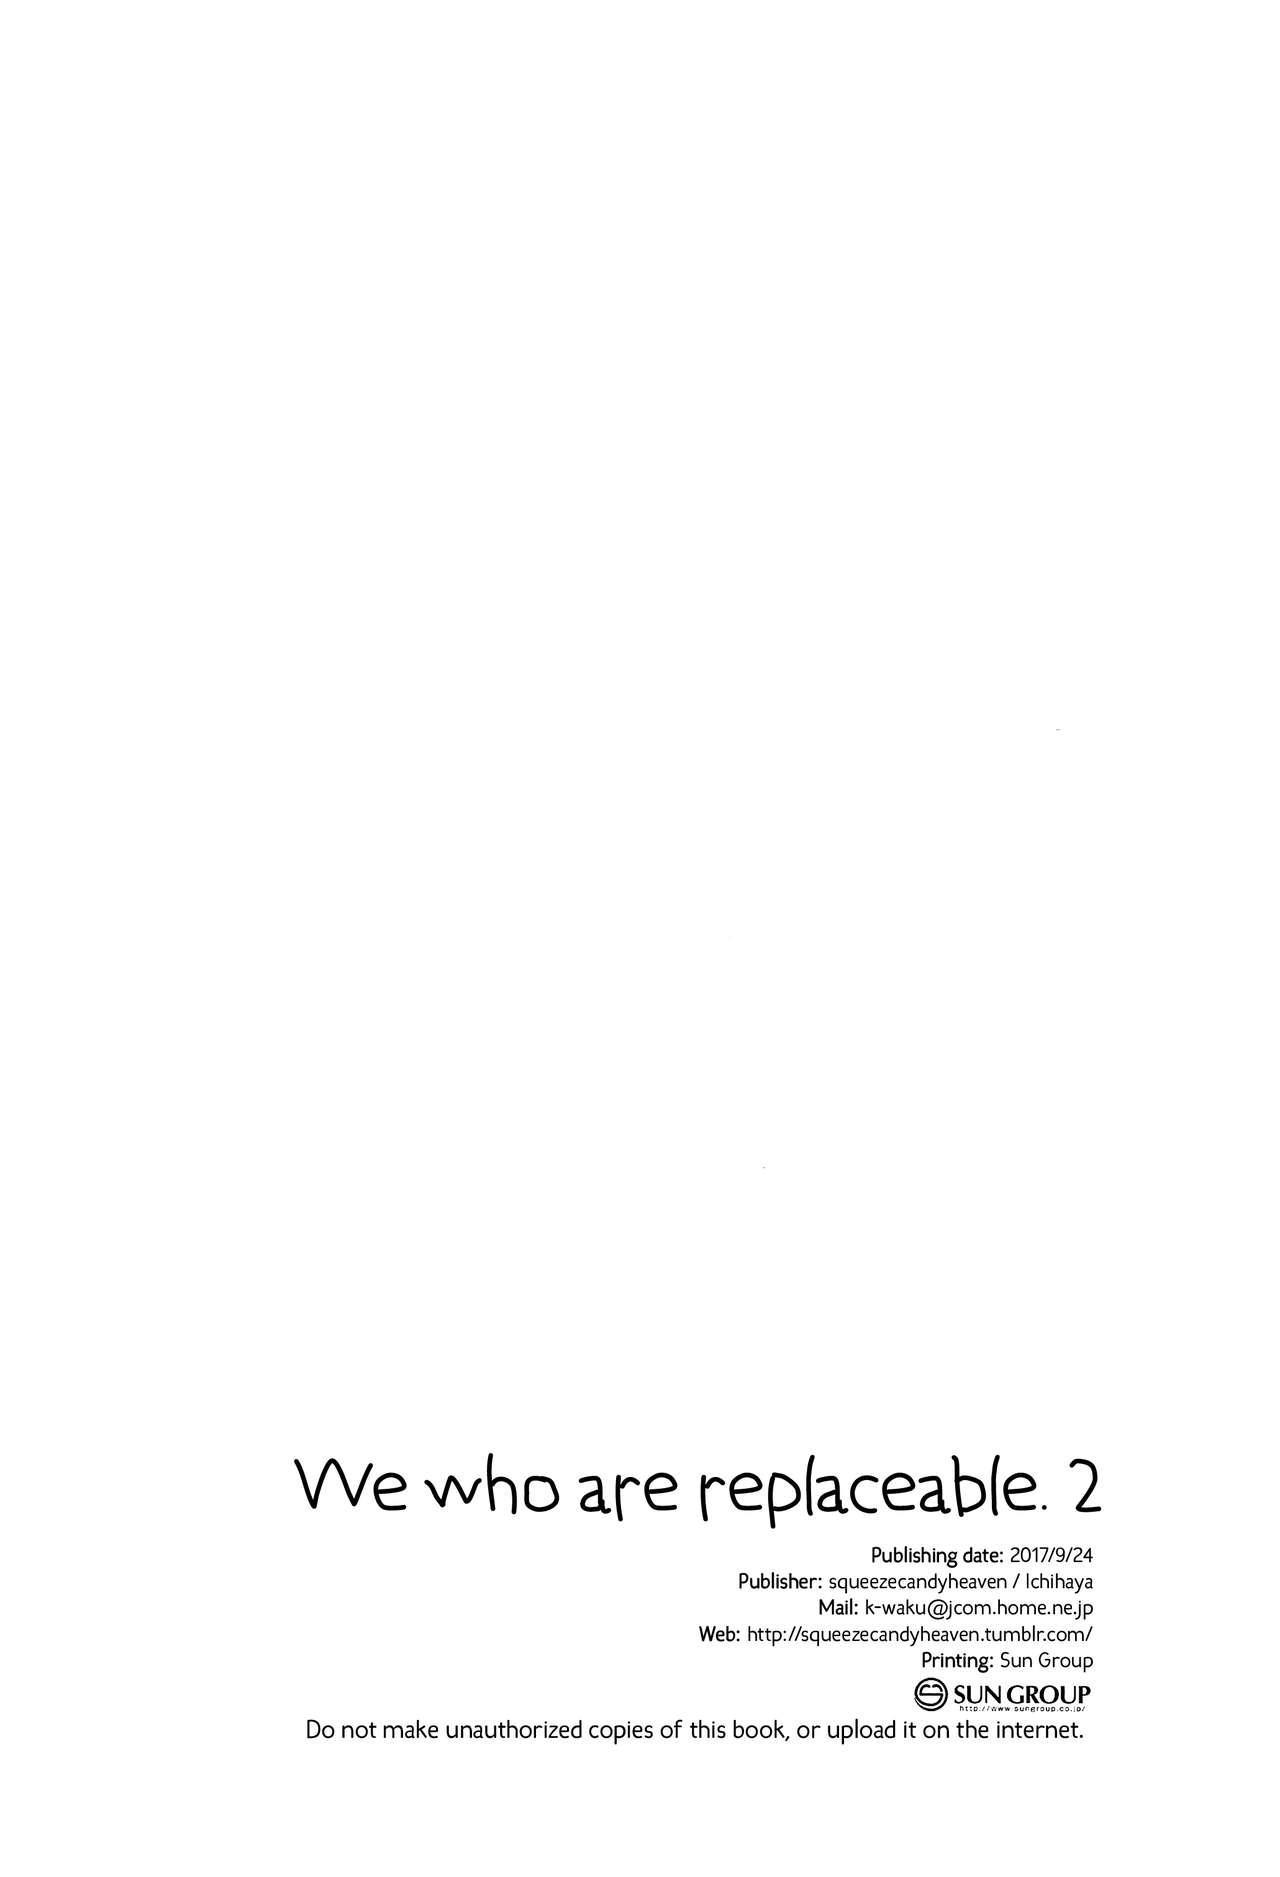 Kakegae no Aru Watashi-tachi 2 | We who are replaceable 2 24